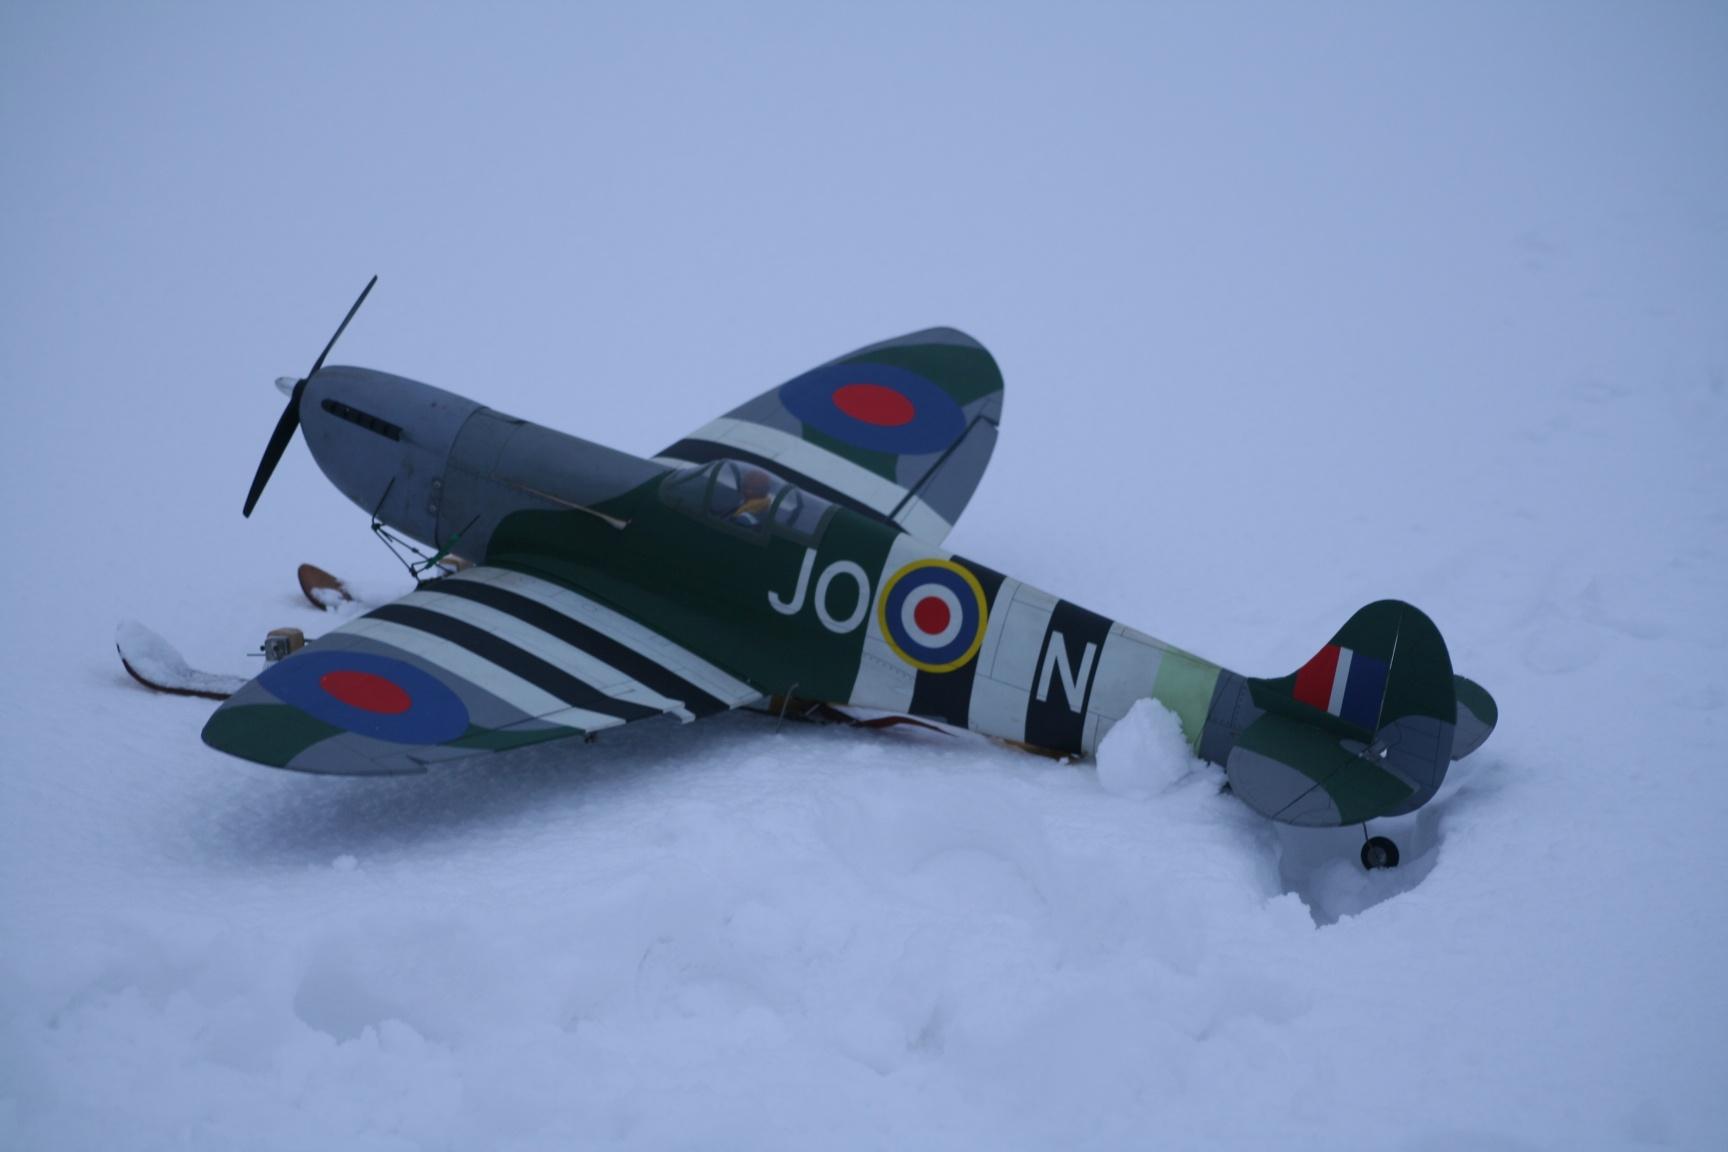 Spitfire On Ski's